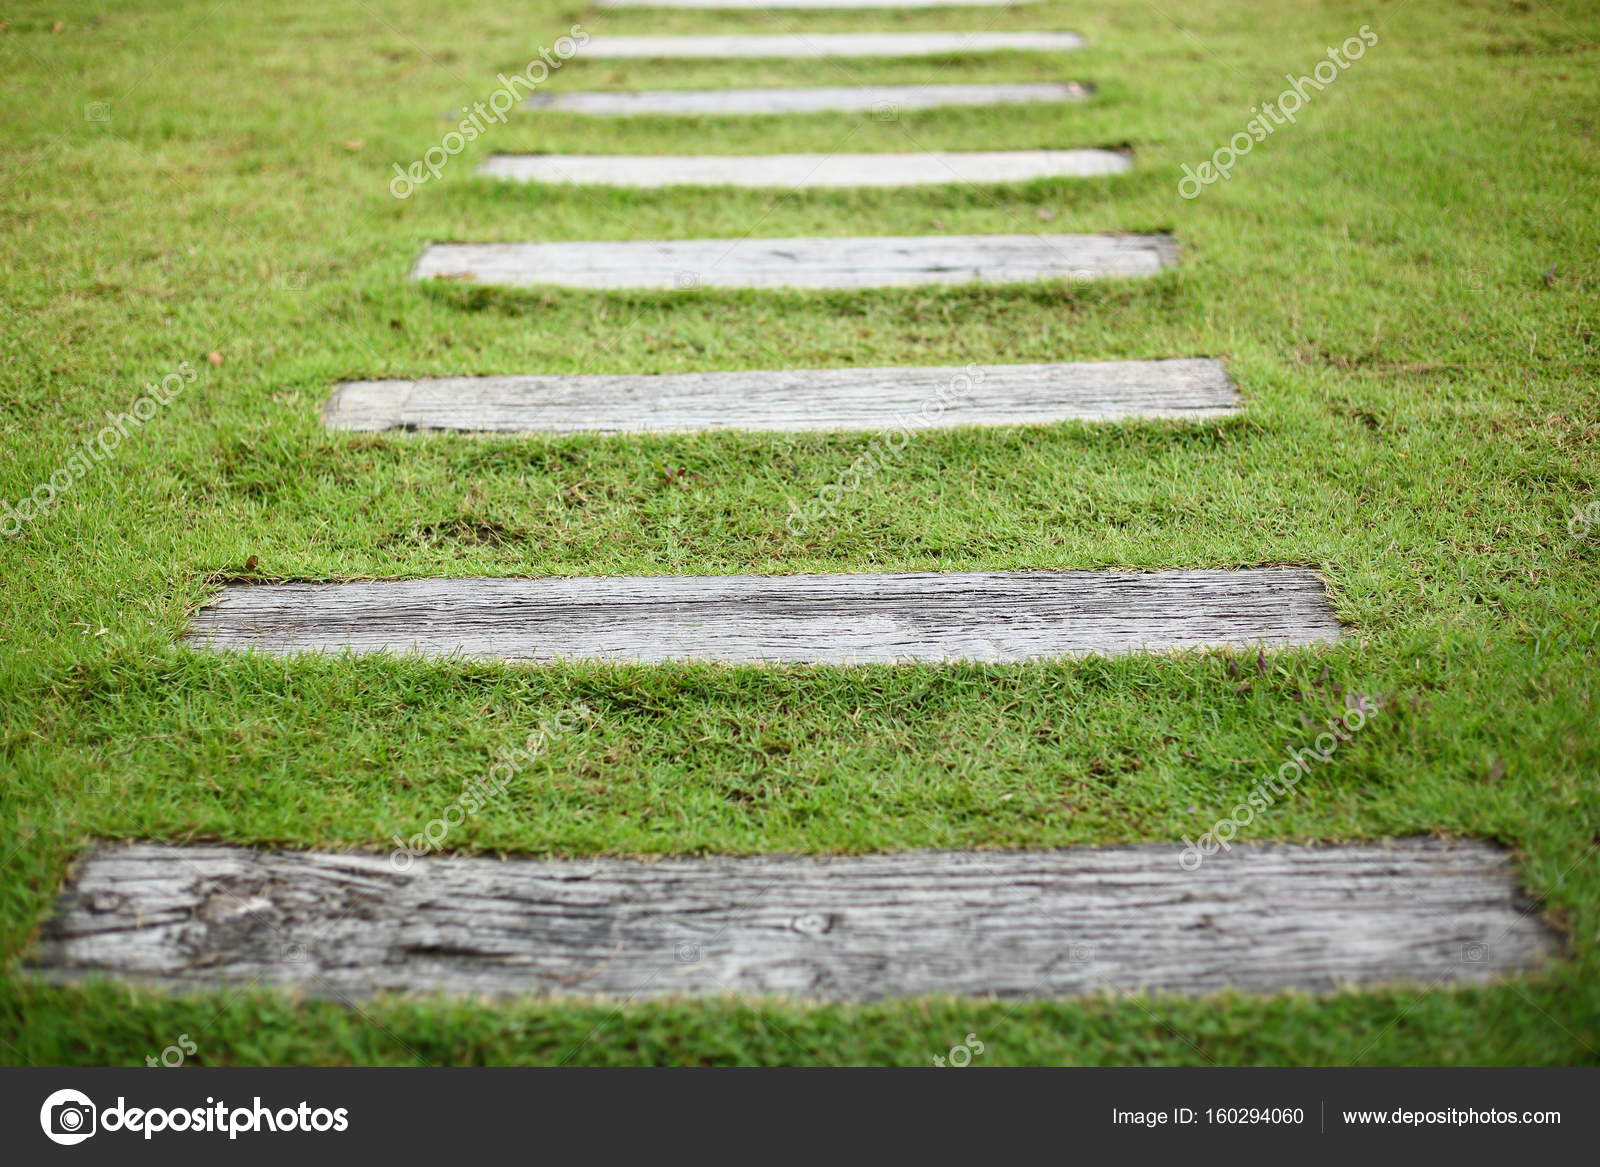 Pavimento camino jardin paso de pavimento camino de hormig n en jard n de la yarda delantera - Pavimento jardin ...